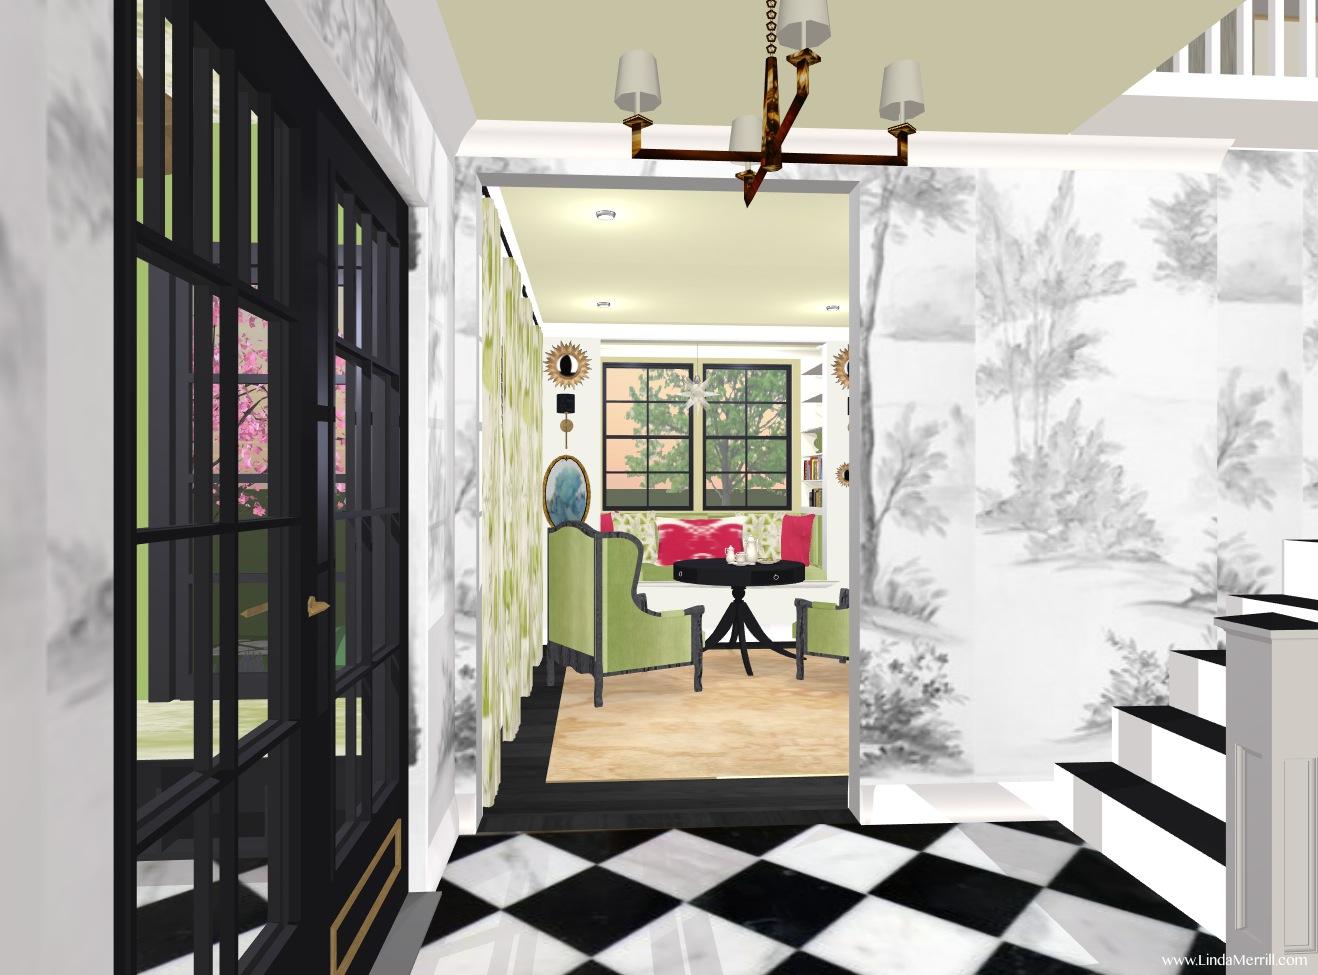 Home Design Interior: Linda\'s Dream House: Window Seats and How ...